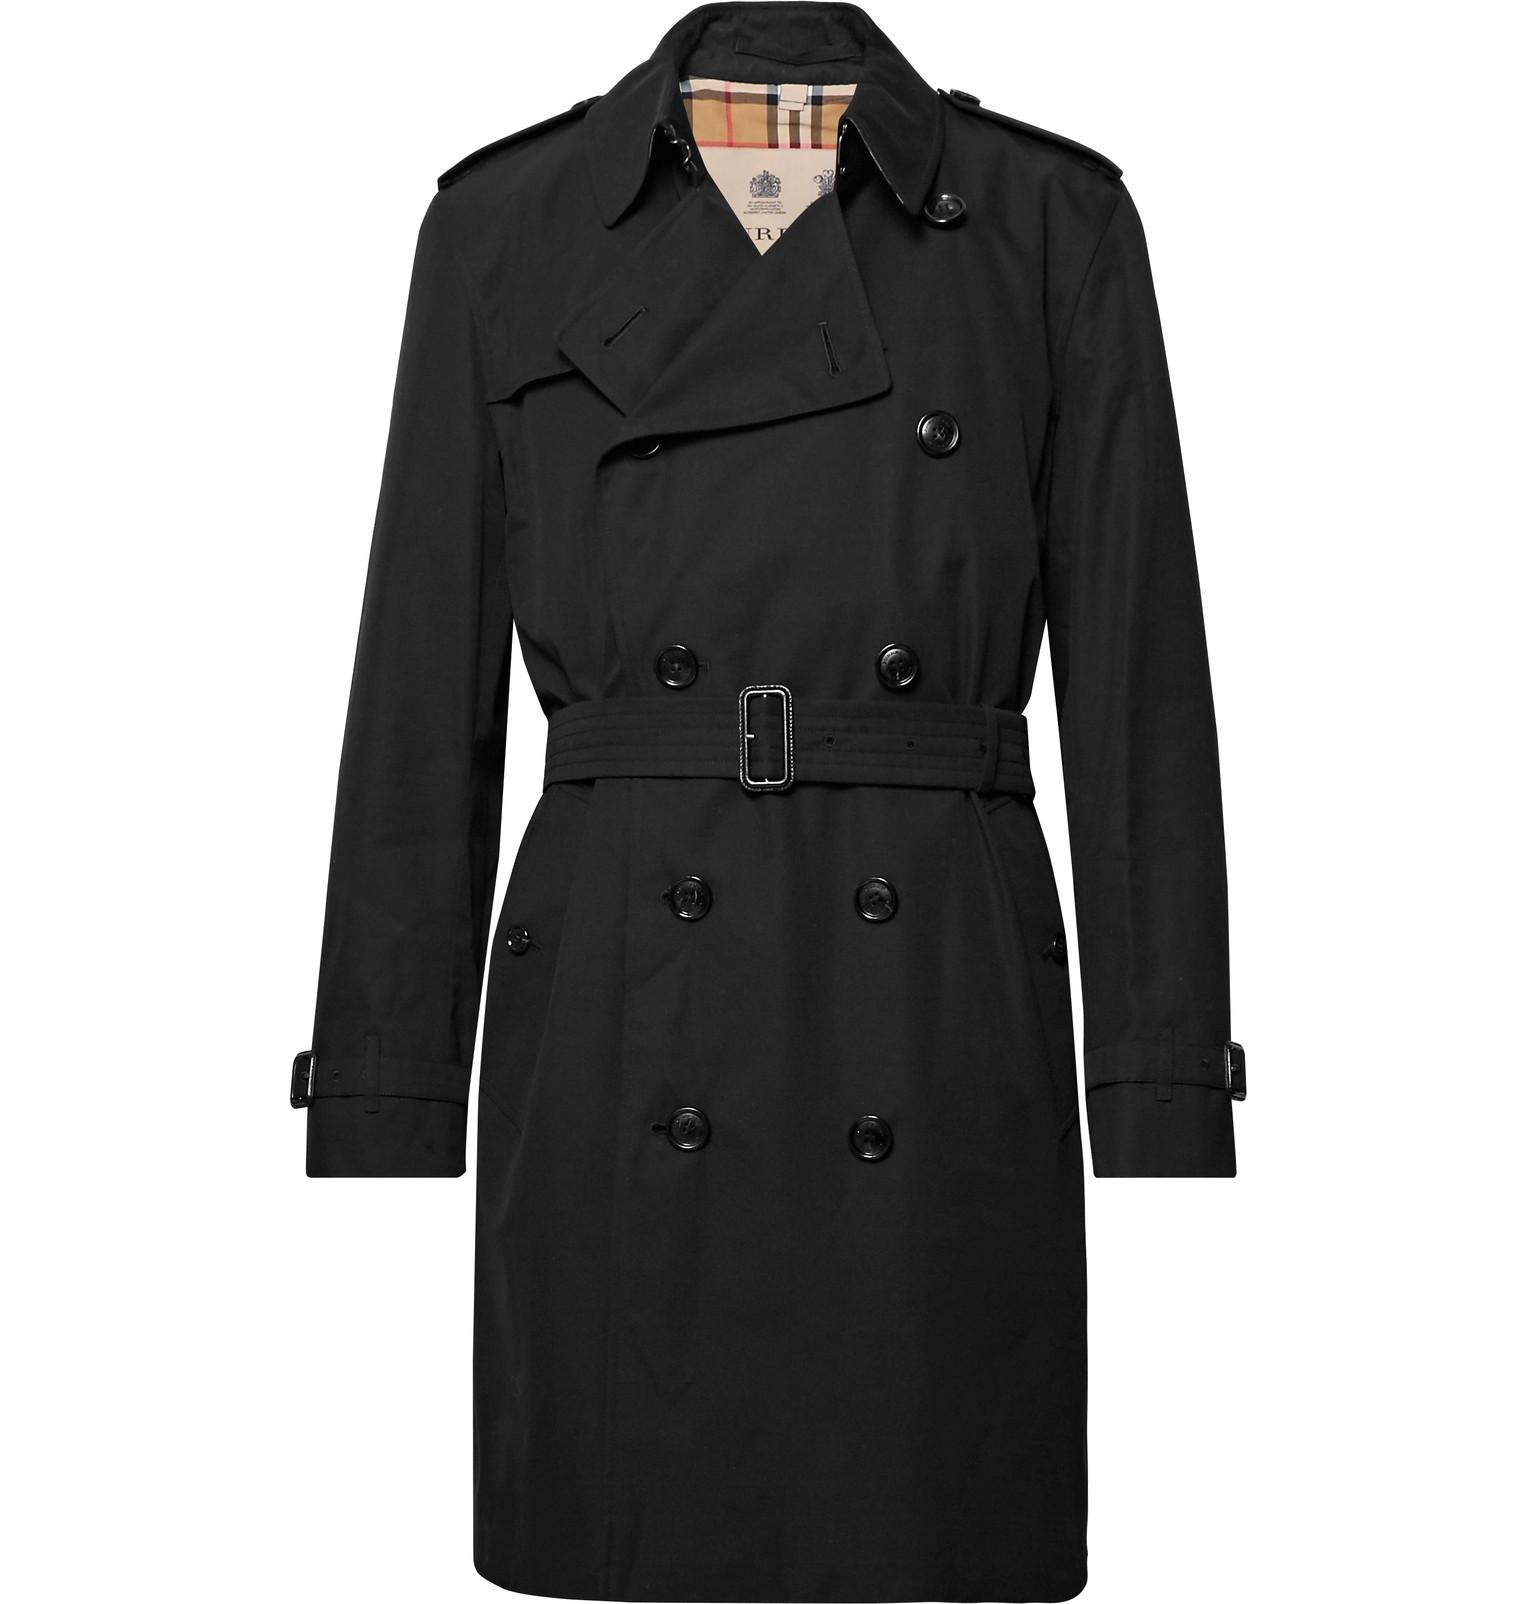 Burberry - Kensington Cotton-Gabardine Trench Coat c3966f727f4